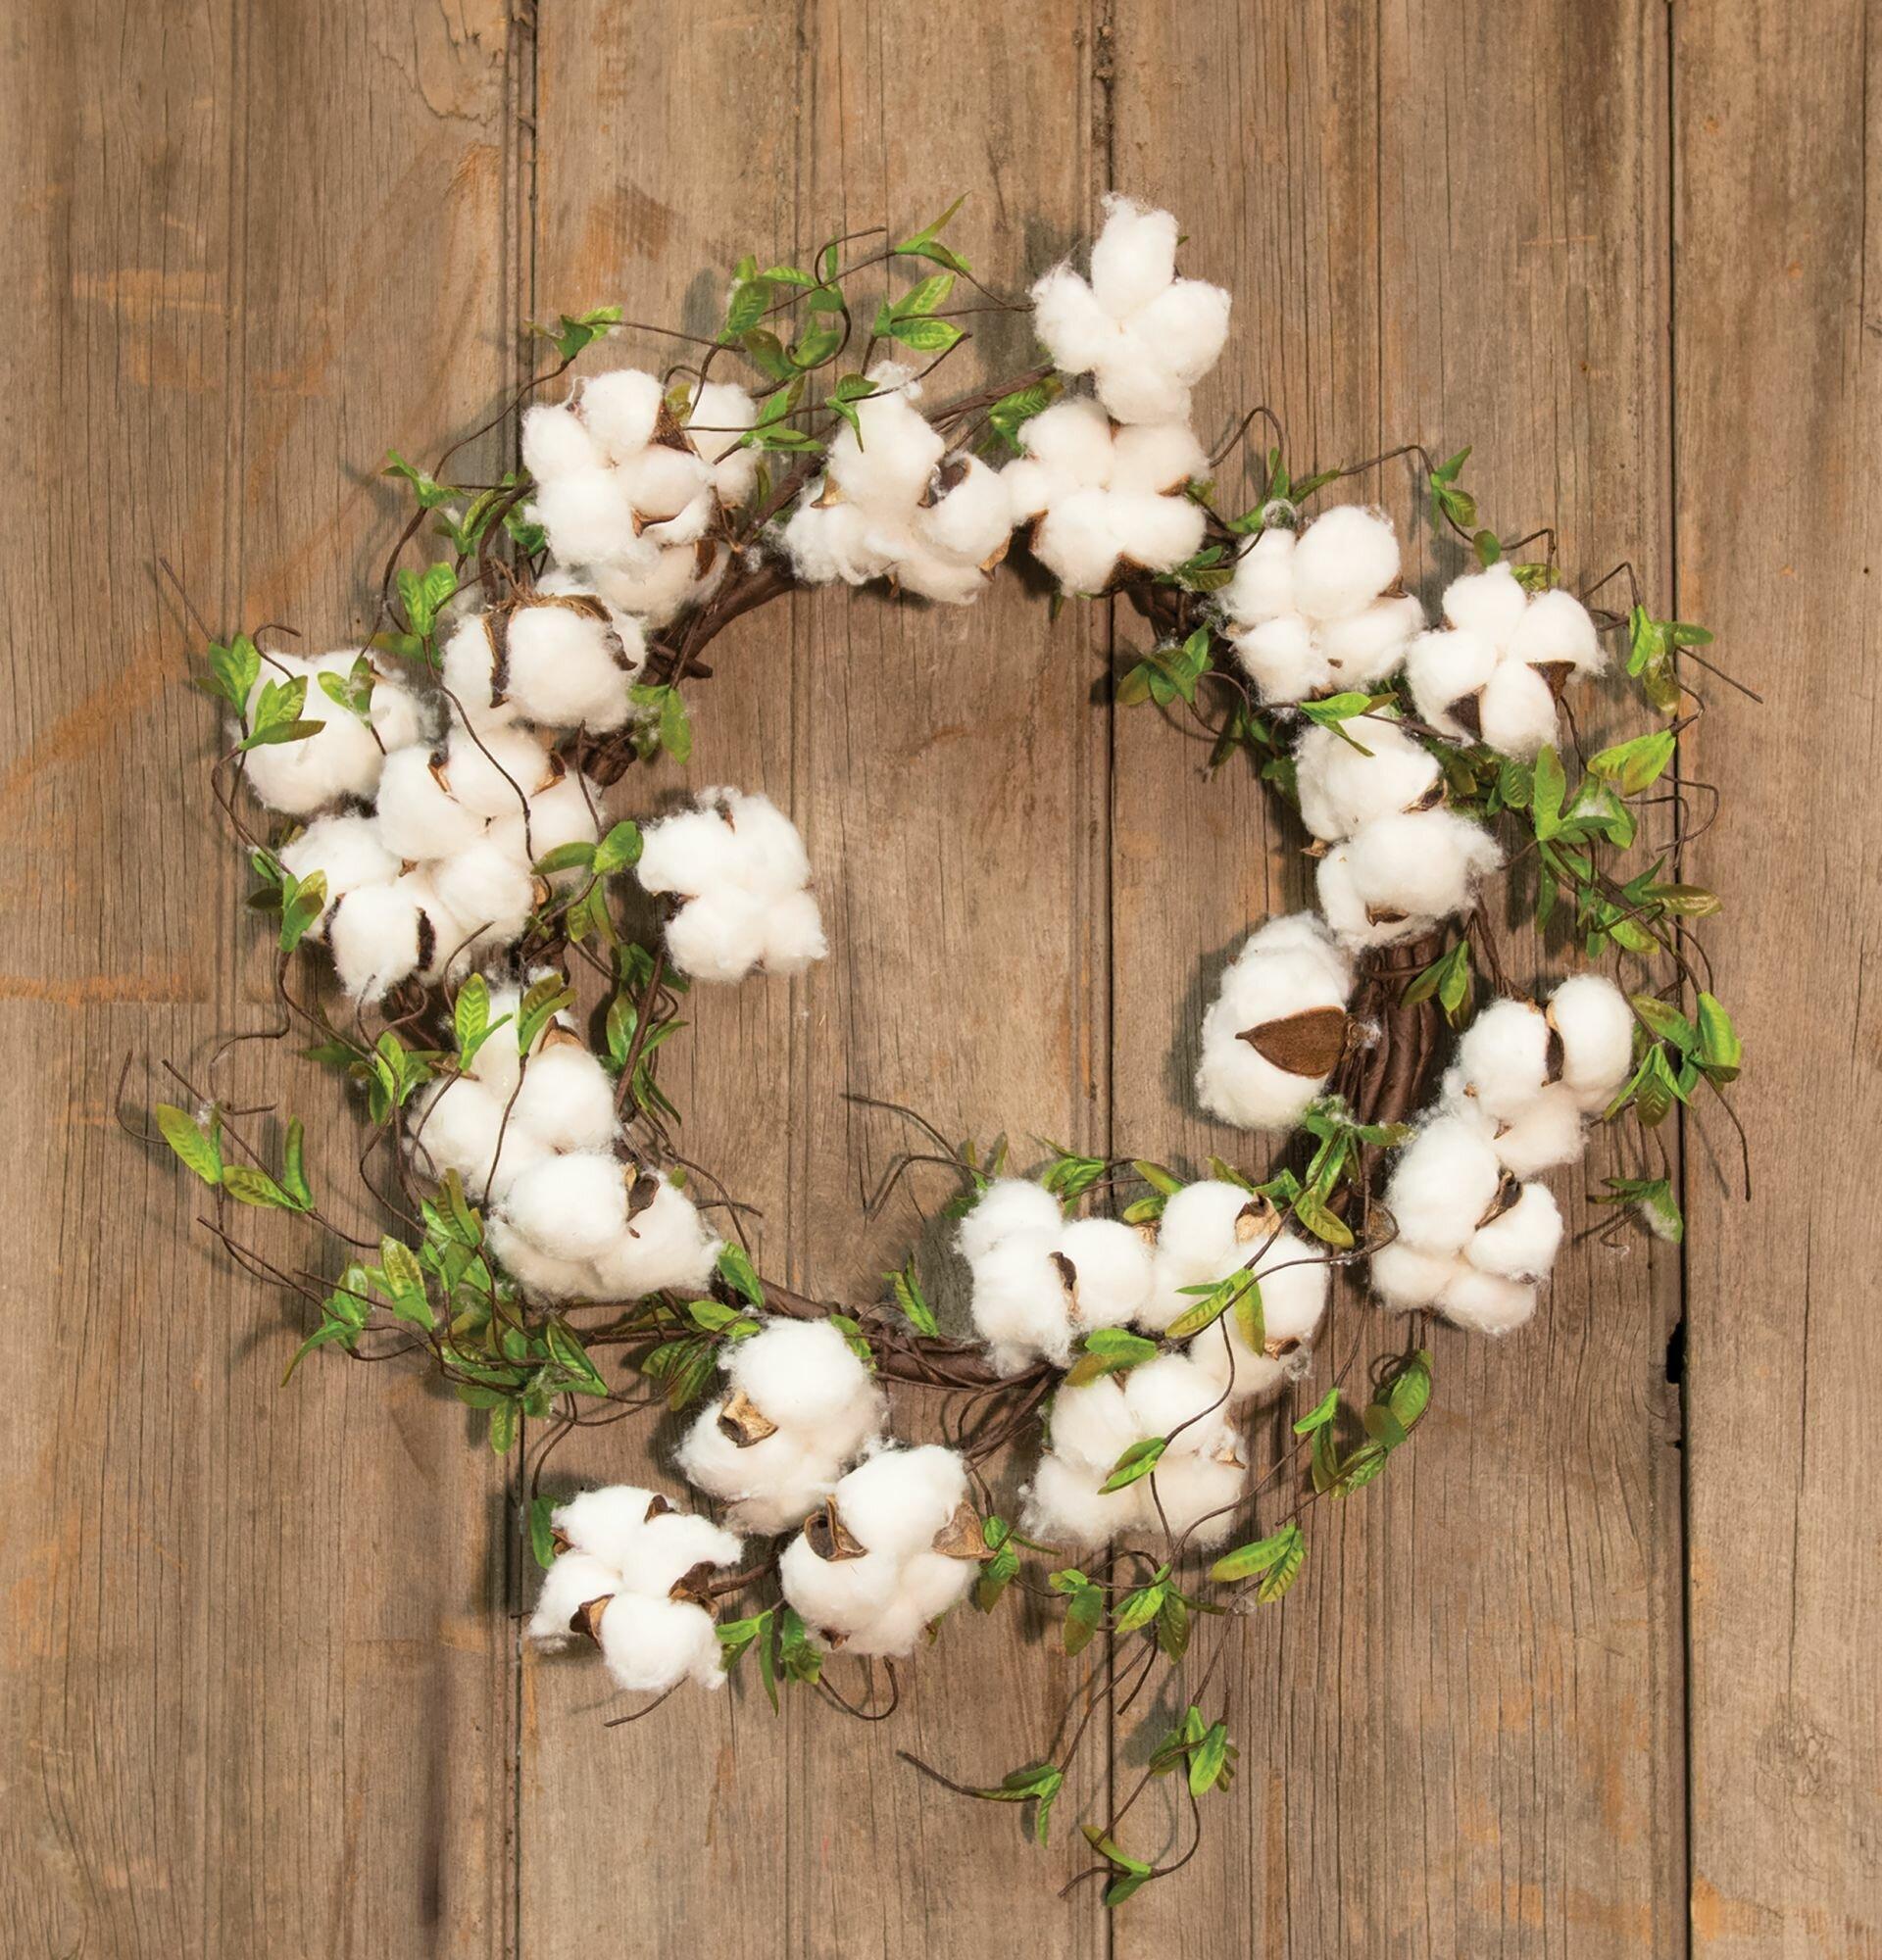 Plow /& Hearth Decorative Cotton Garland